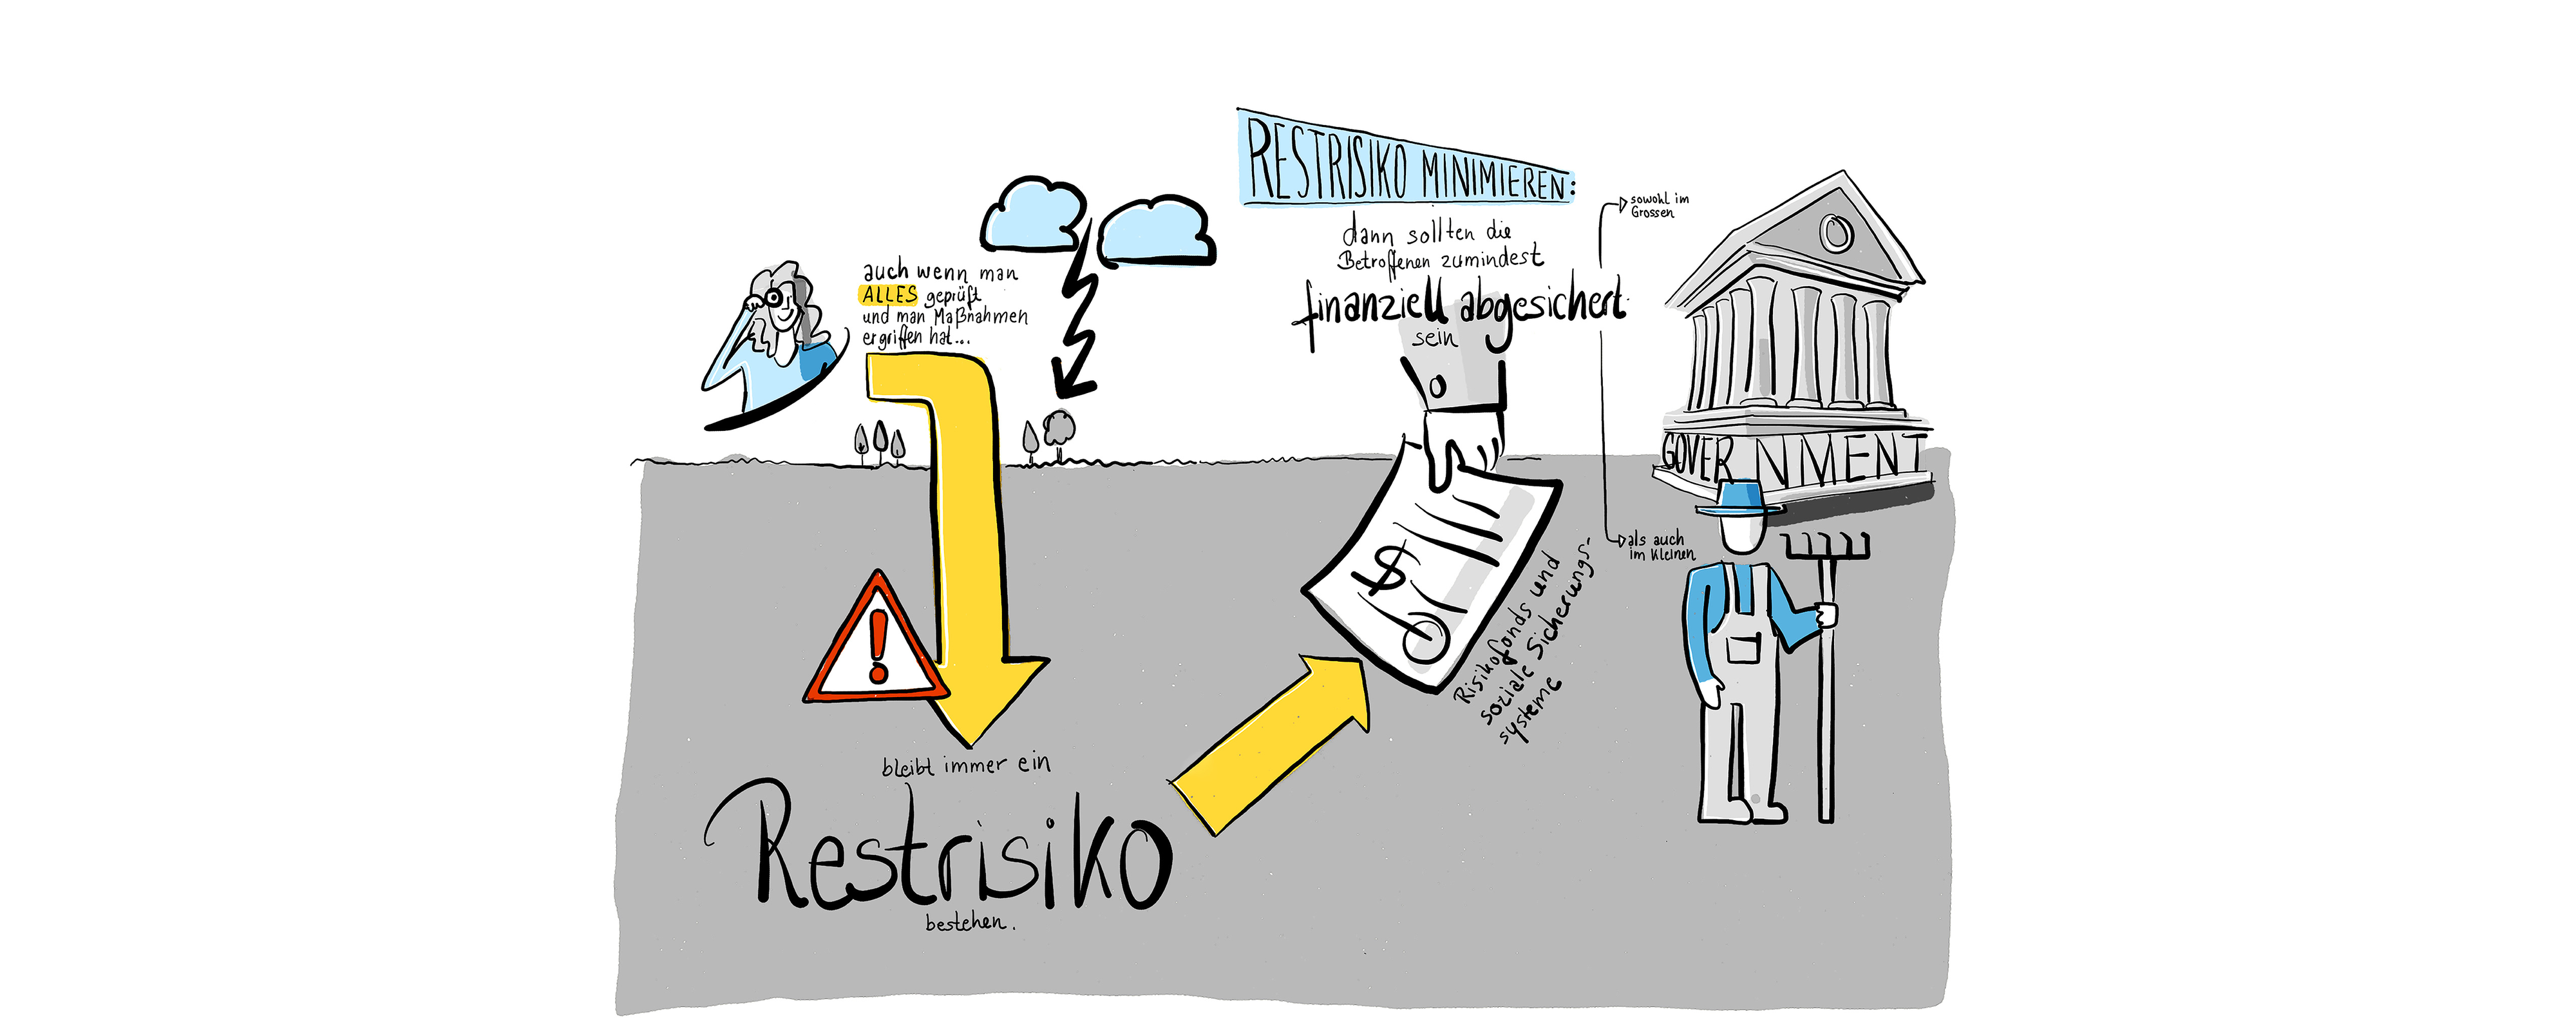 Instrumente des Katastrophenrisikomanagements: Finanzielle Risiken minimieren